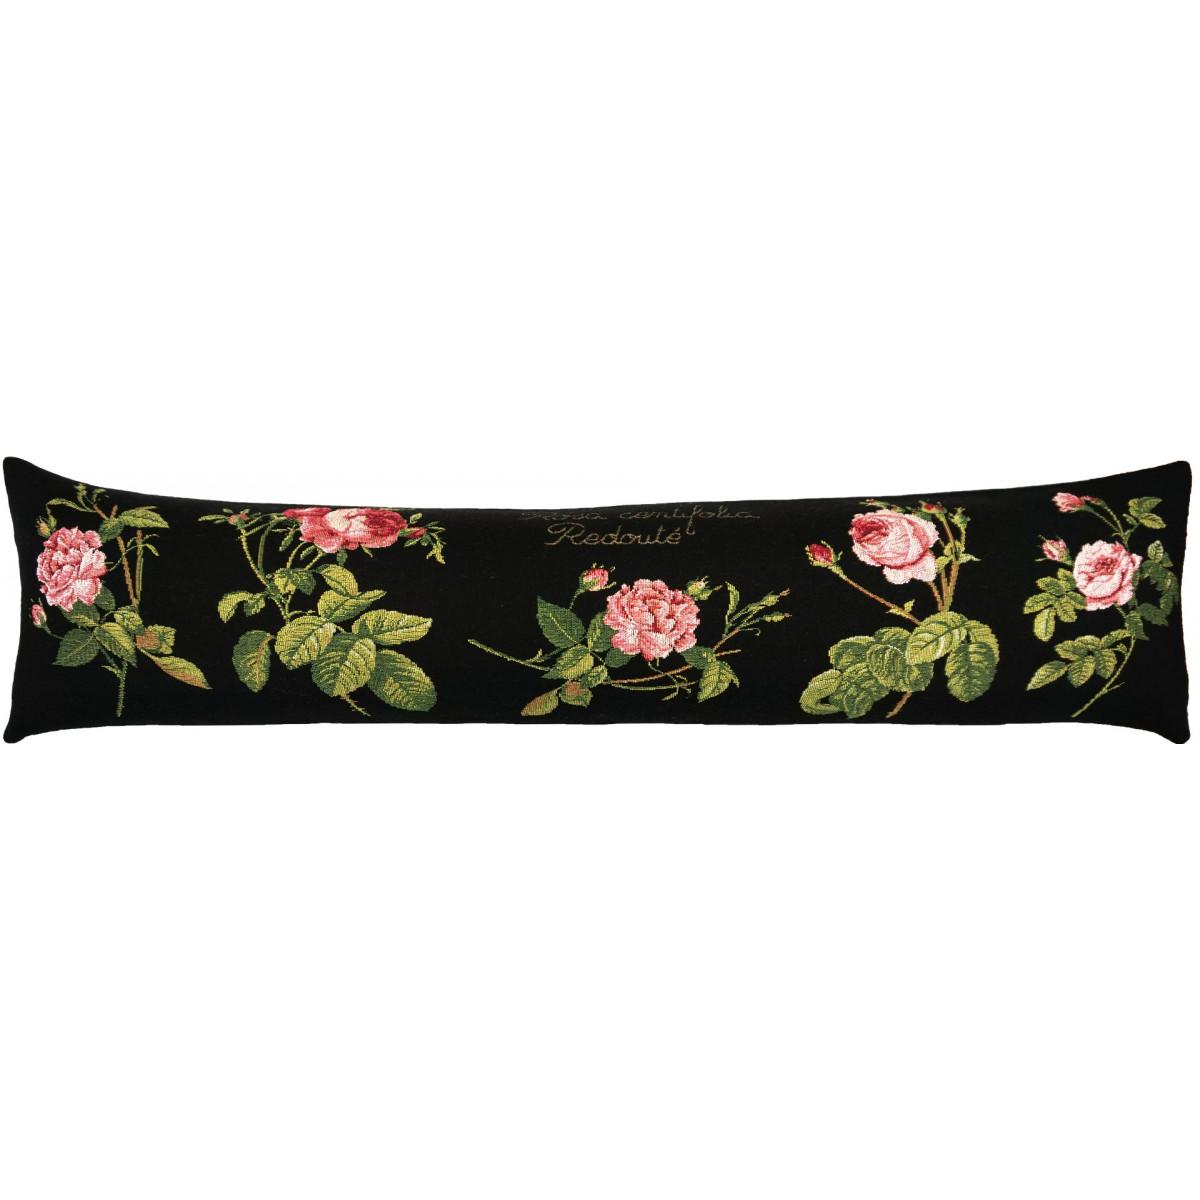 Coussin roses de redouté made in france noir 25x90